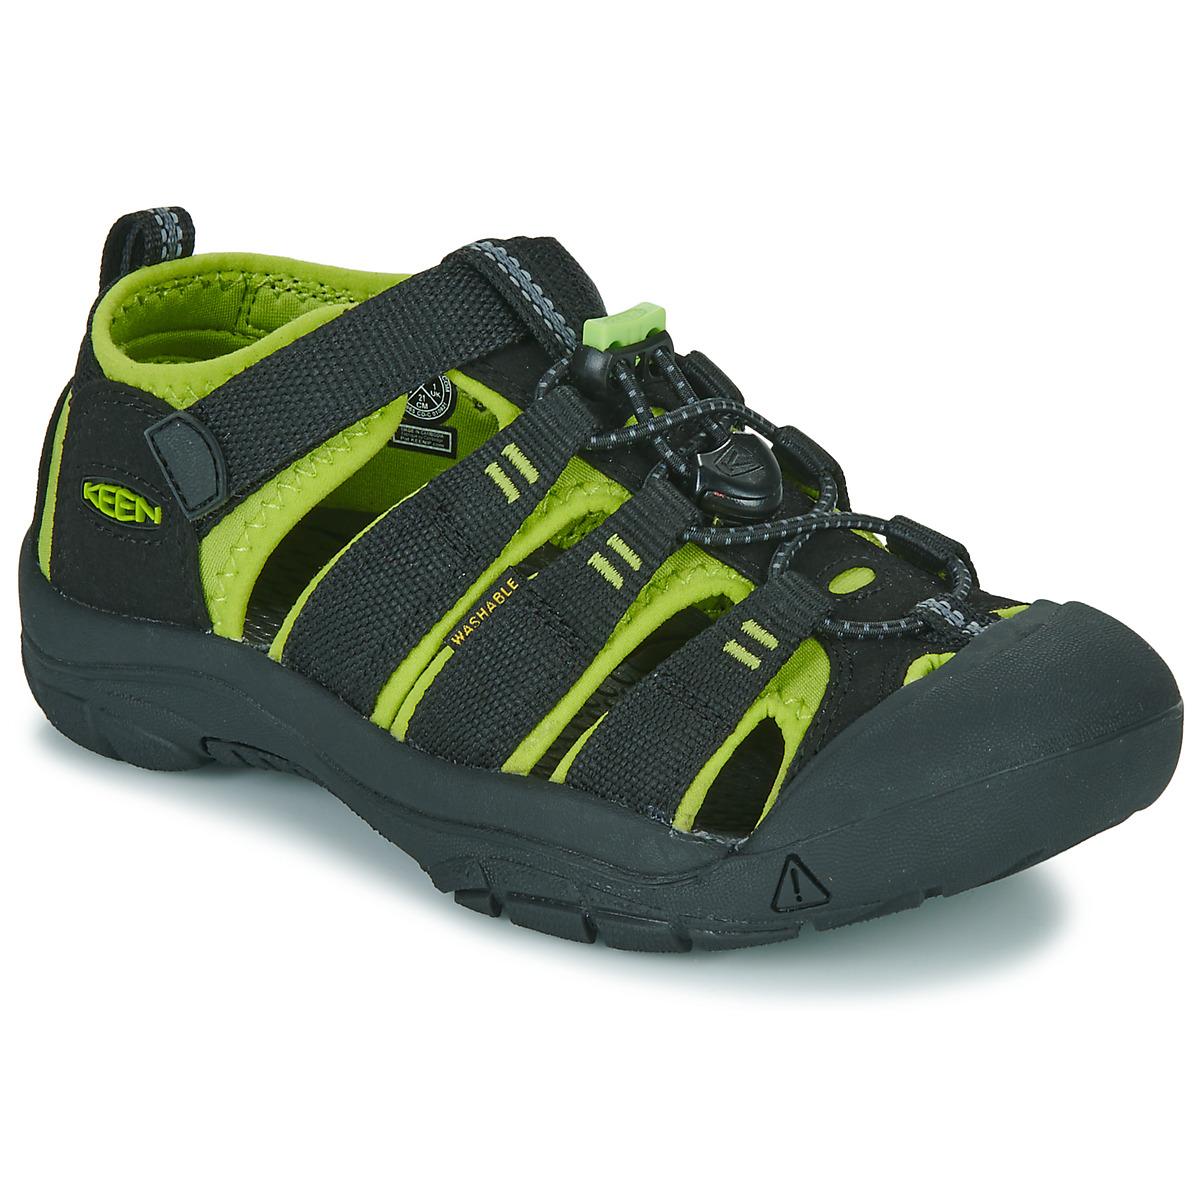 sportliche sandalen keen kids newport h2 schwarz gr n. Black Bedroom Furniture Sets. Home Design Ideas